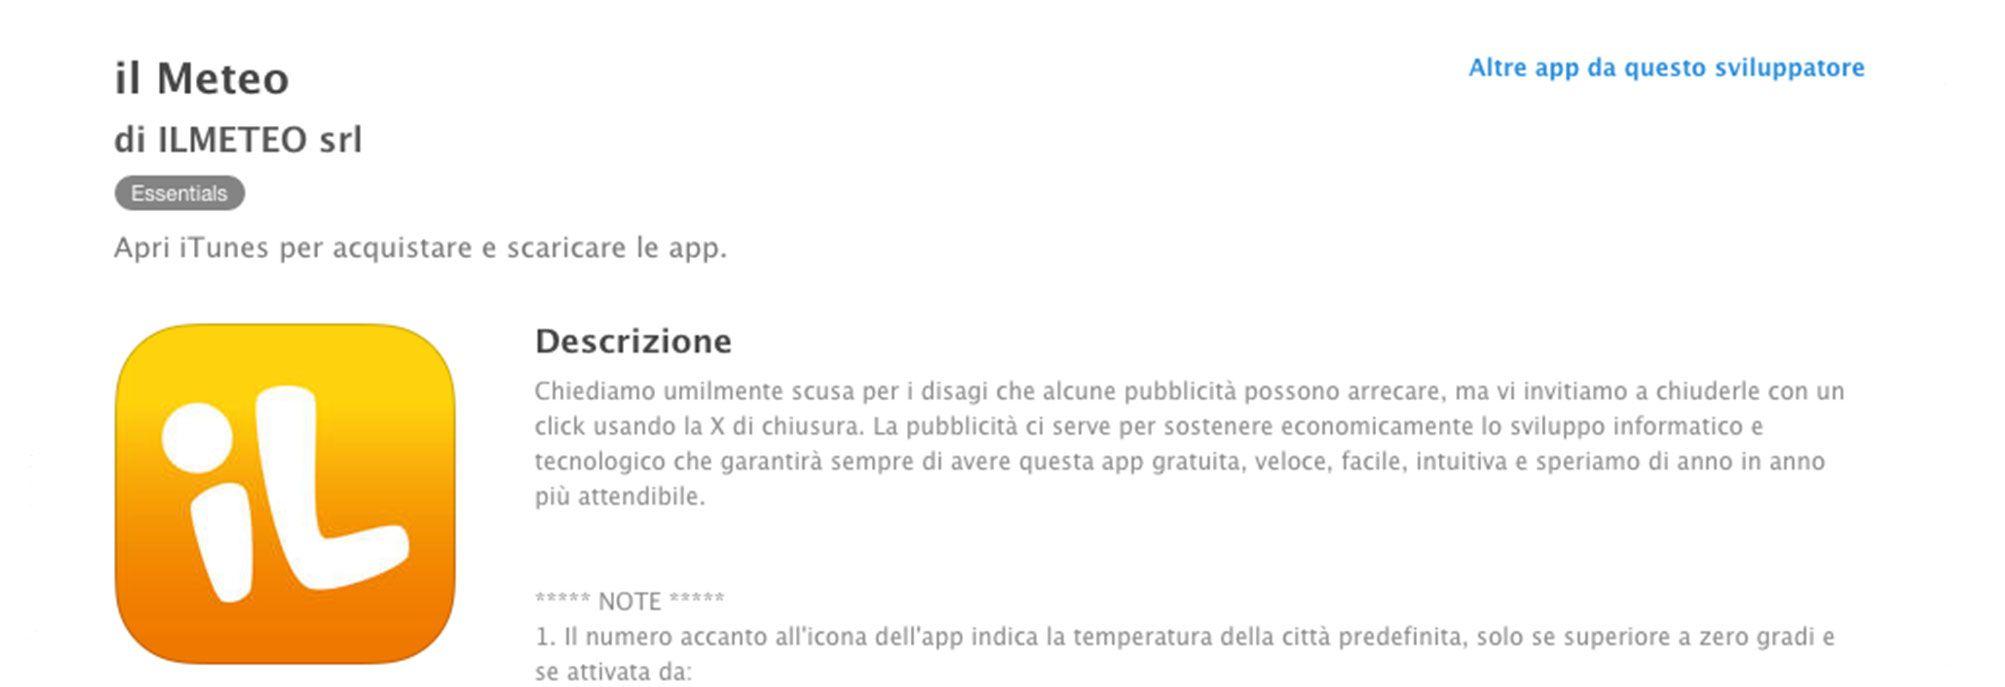 Copywriting app Ilmeteo